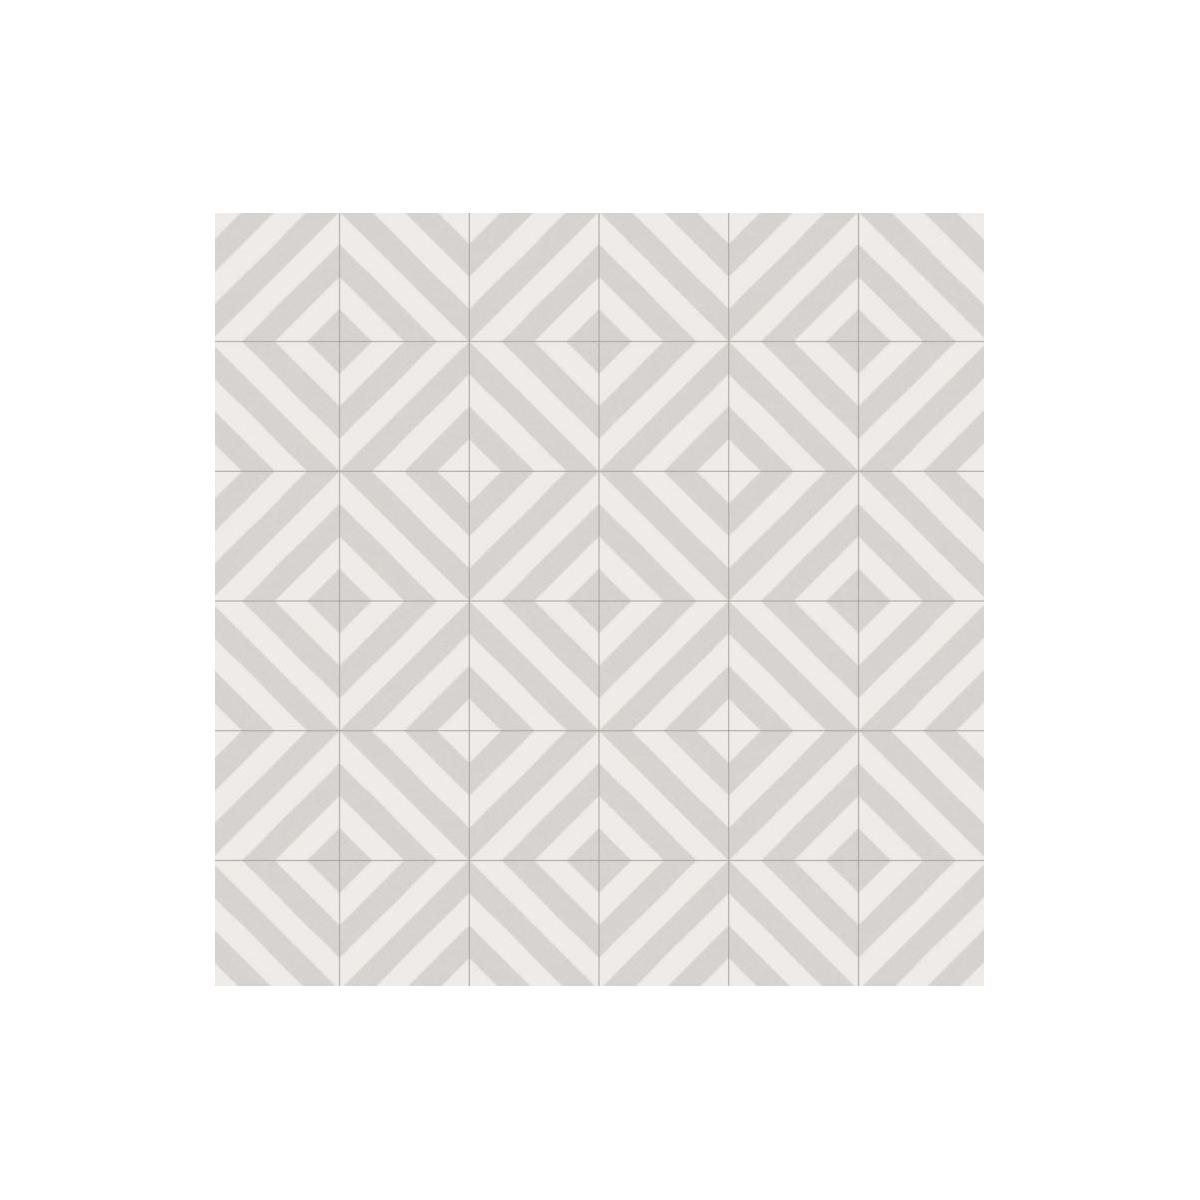 Goroka Gris (m2) - Pavimento hidráulico Porcelánico antideslizante Vives